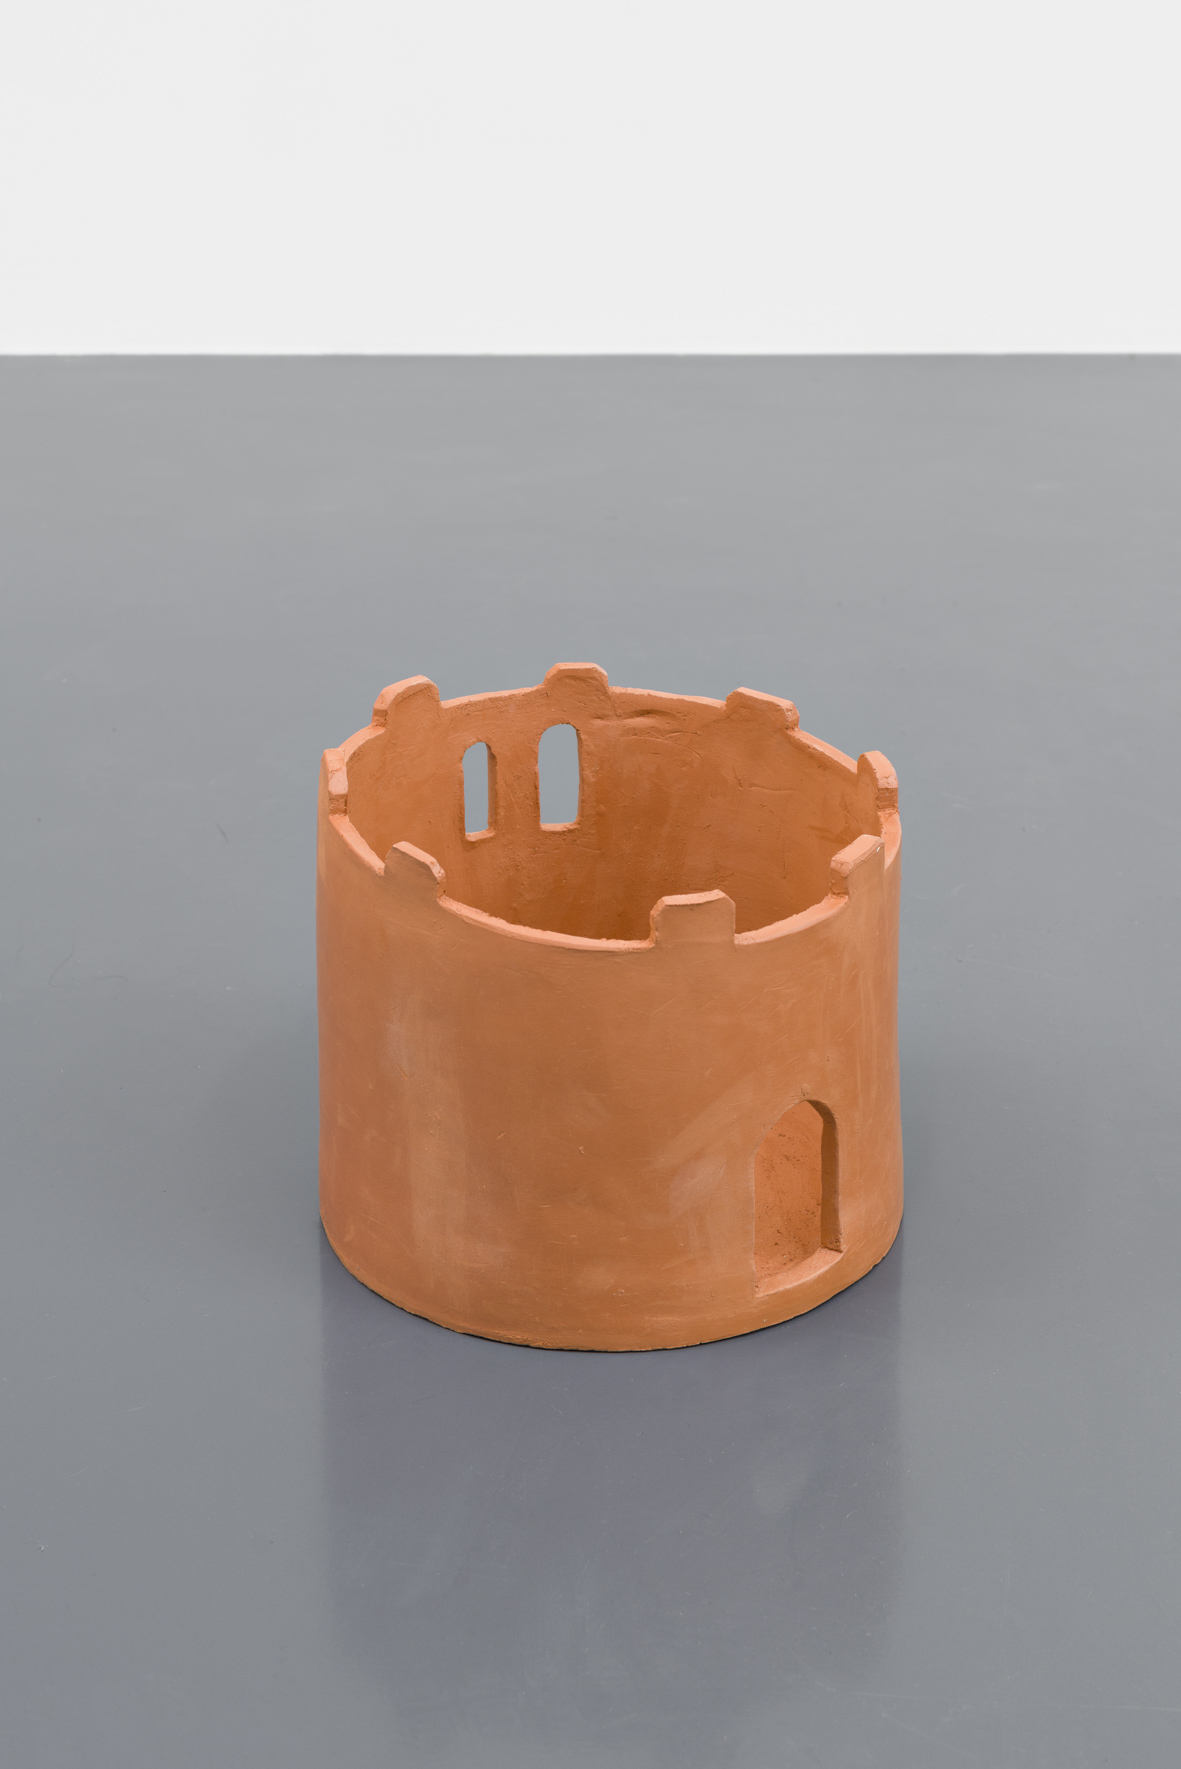 Lena Henke, The red tower, 2016, Ceramic, h=19.5, Ø22.4cm, Courtesy: Galerie Emanuel Layr